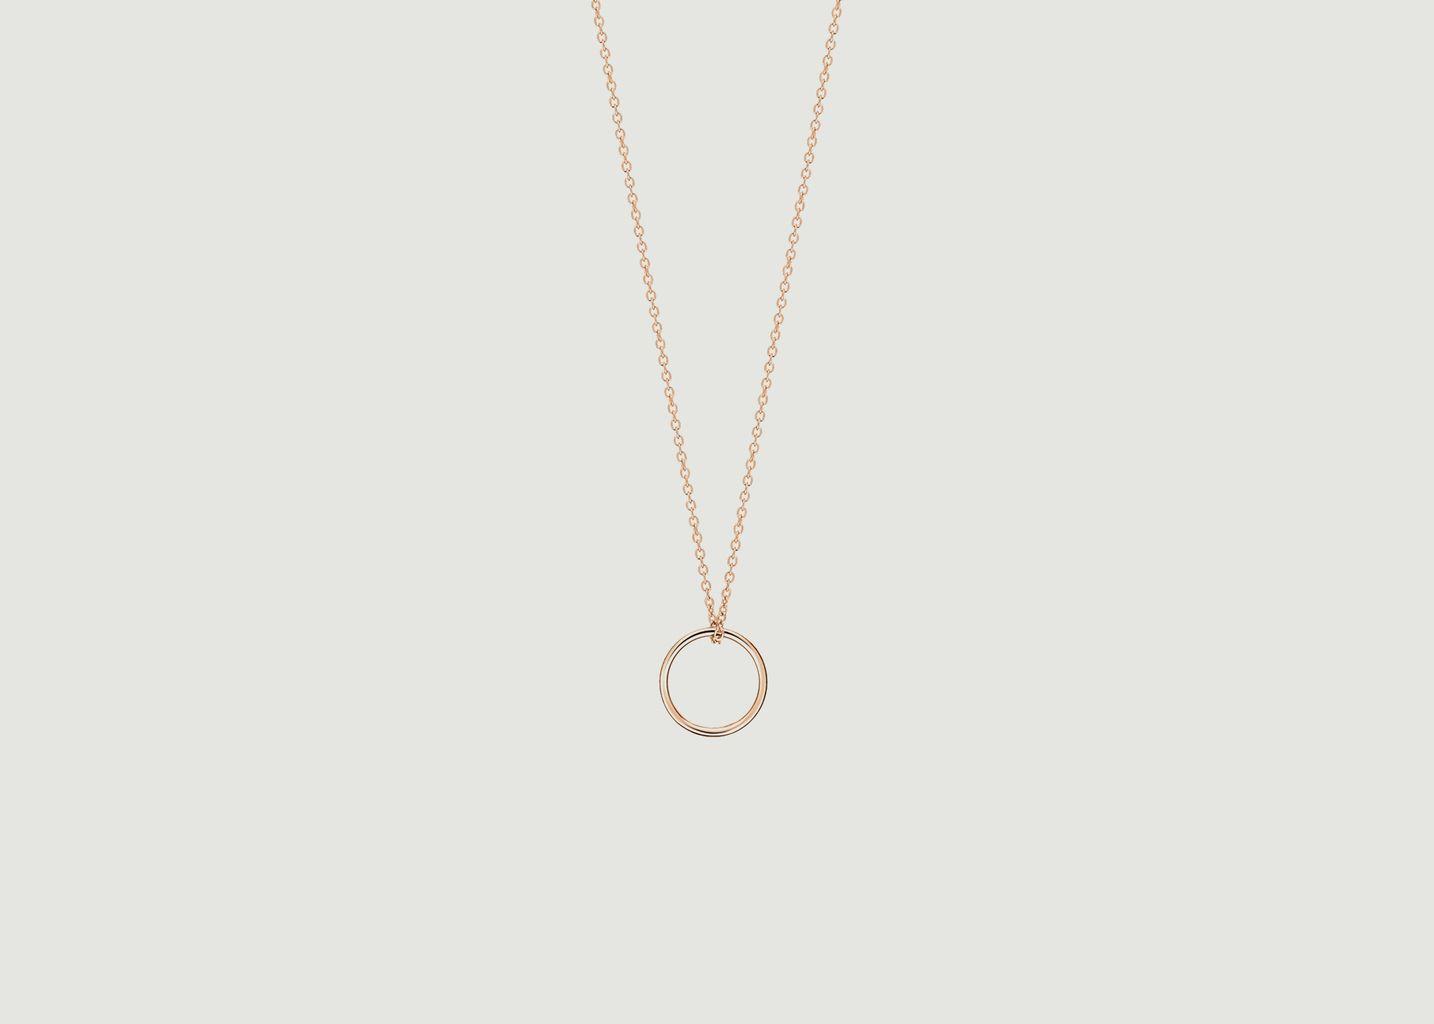 Collier Tiny Circle - Ginette NY